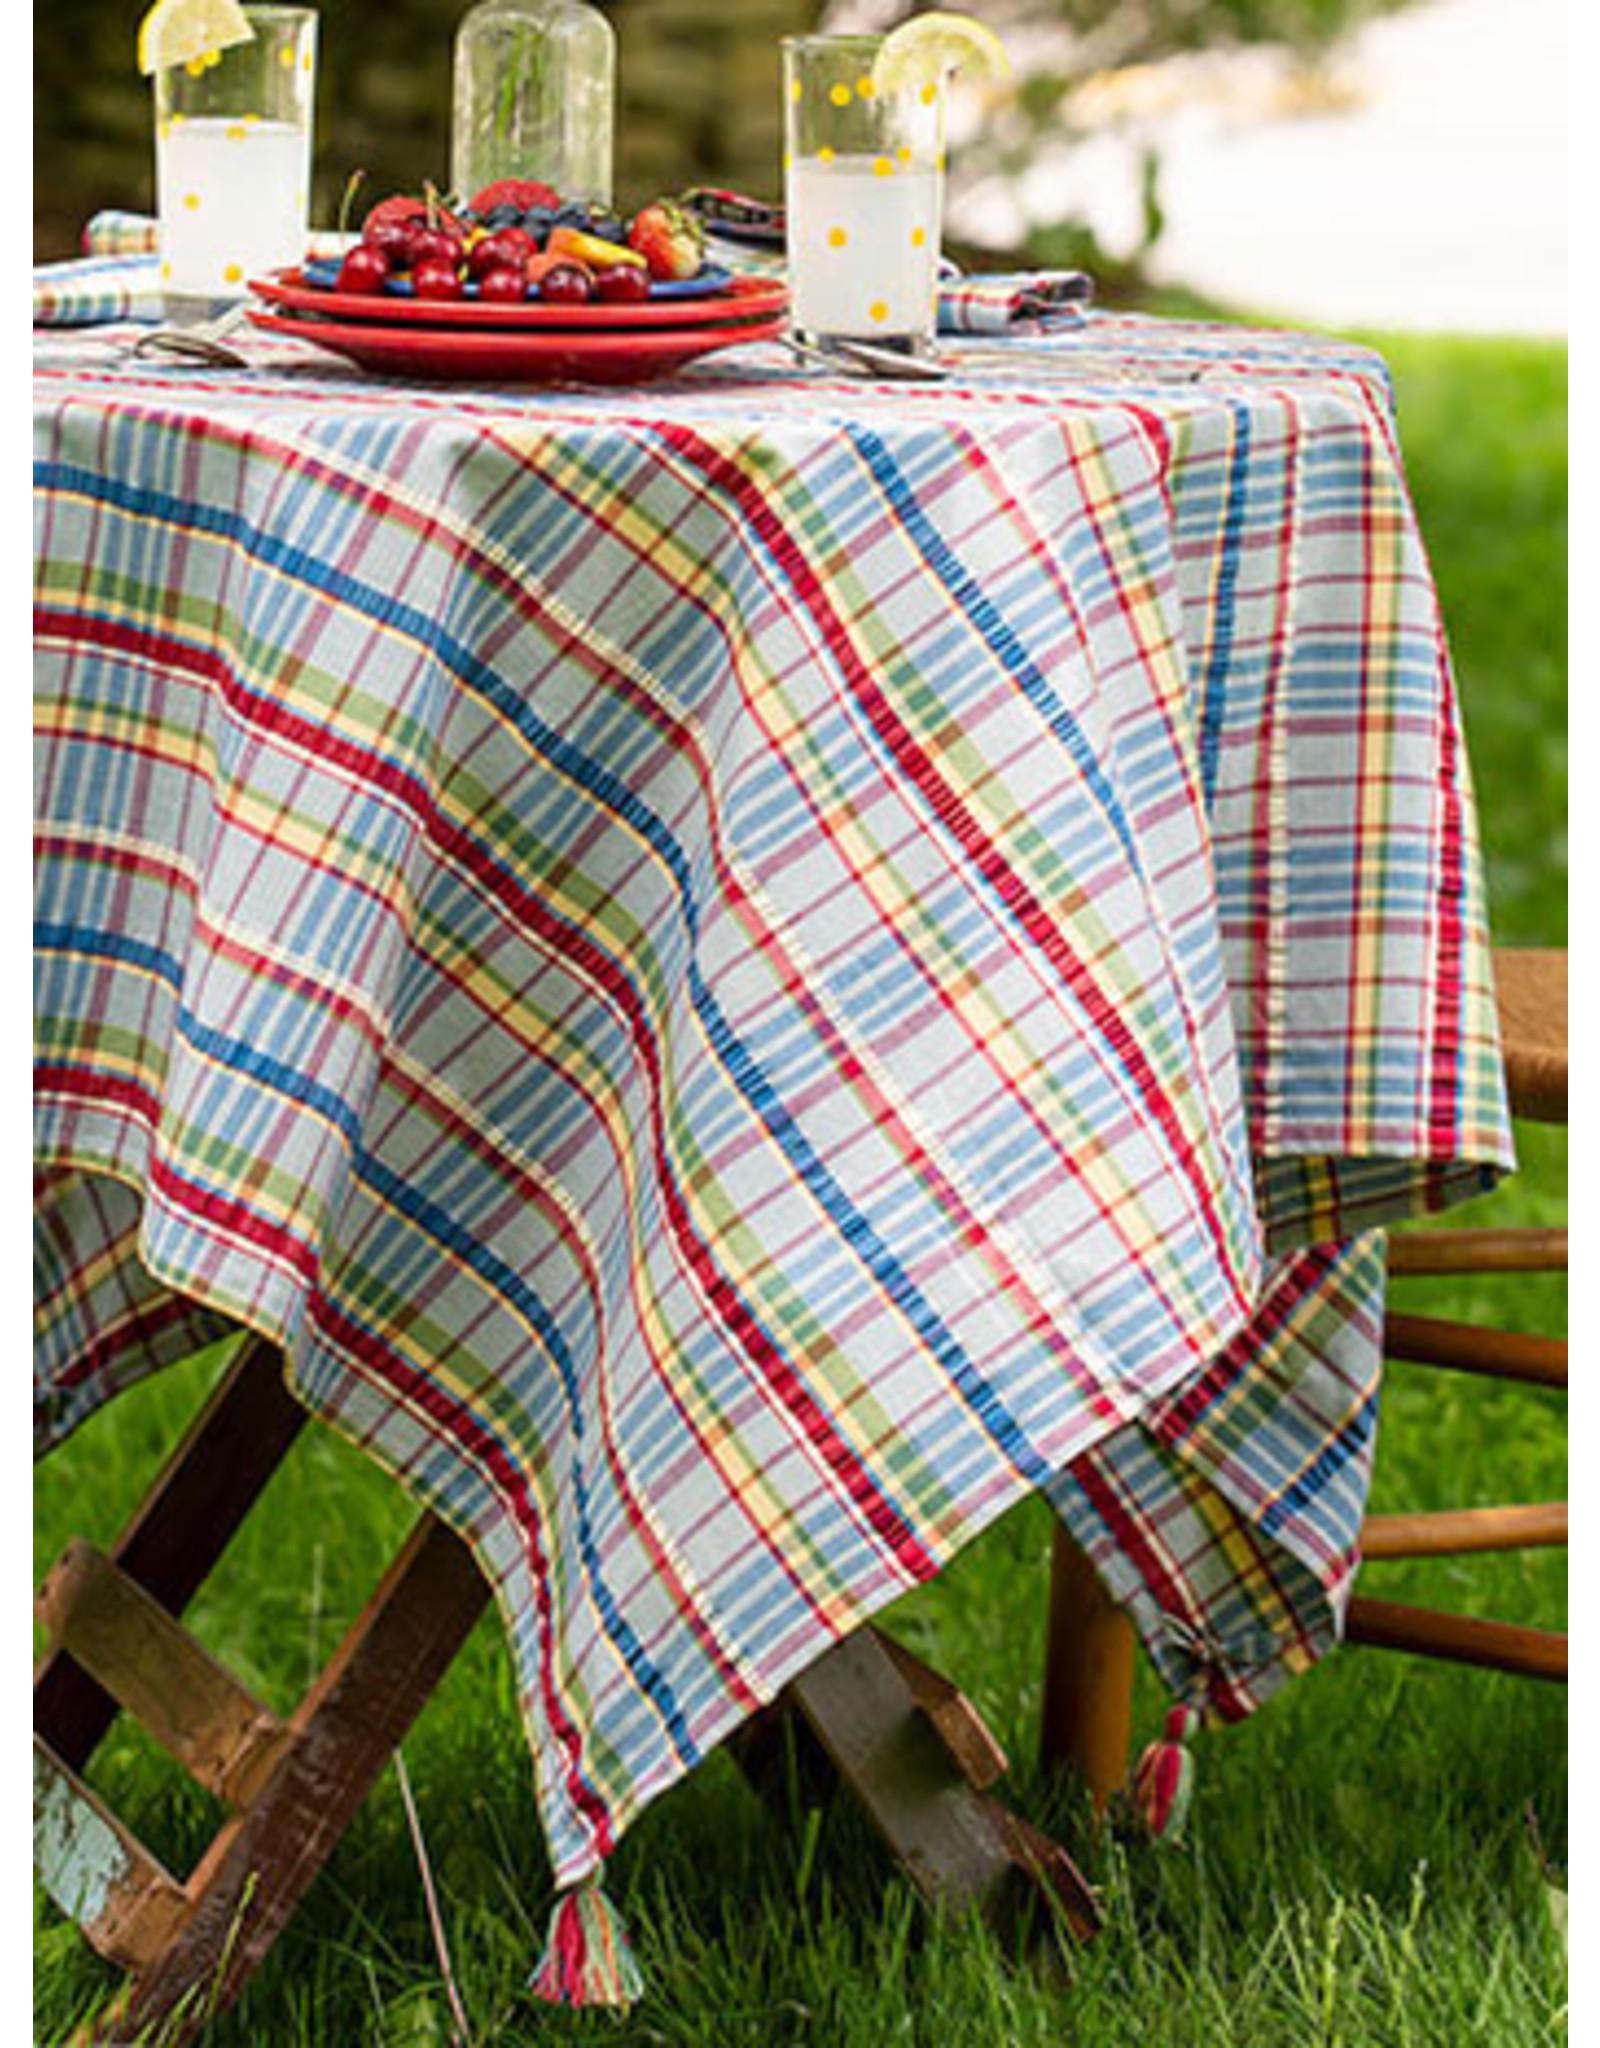 April Cornell April Cornell Picnic Seersucker Tablecloth 60x90